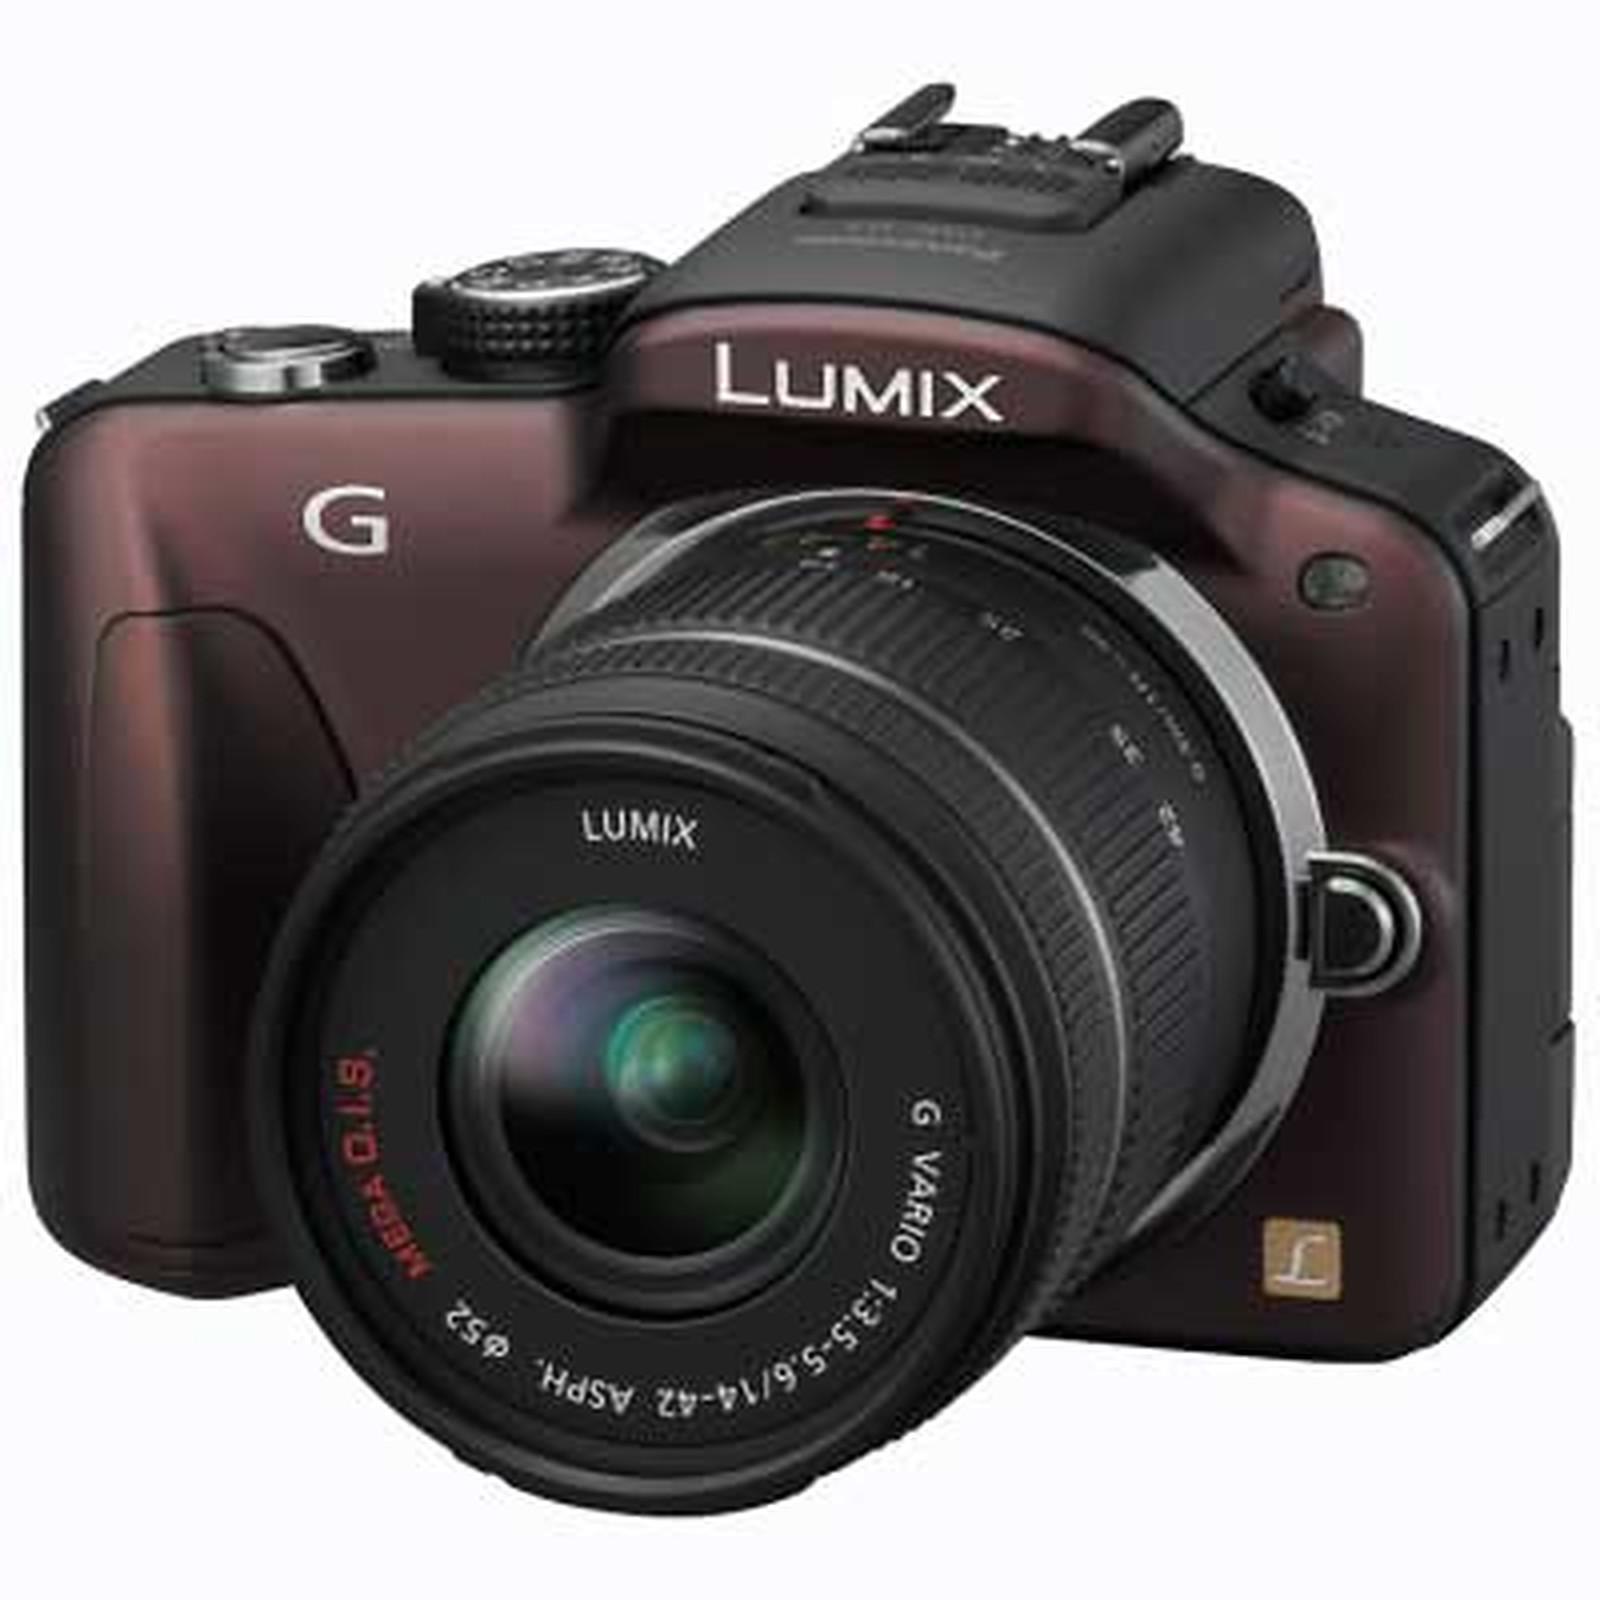 Panasonic Lumix DMC-G3 Chocolat avec objectif VARIO 14-42mm